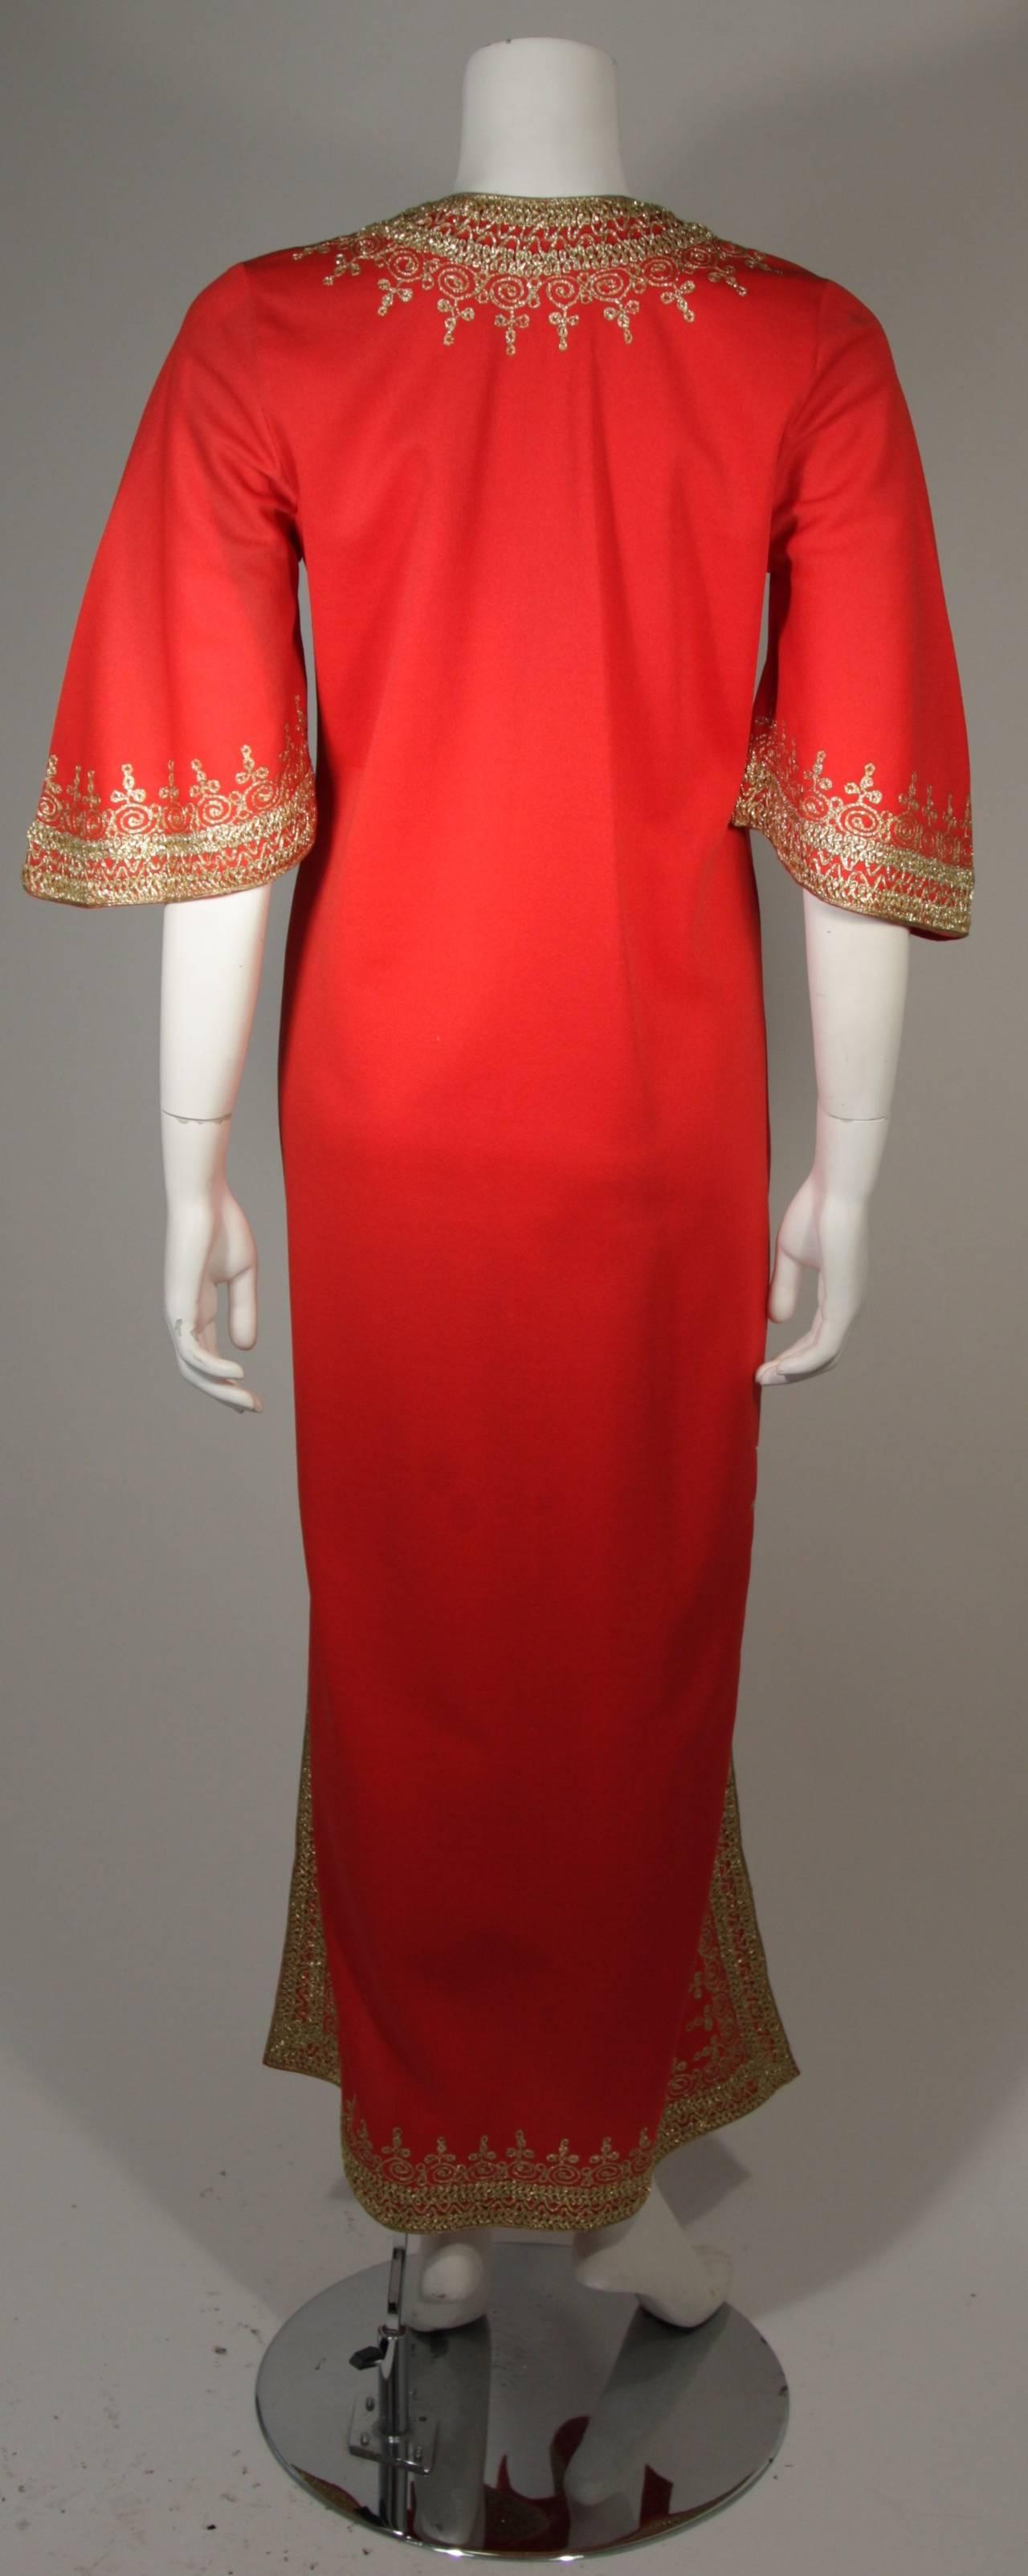 Custom Orange and Gold Indian Kaftan Size Small 7